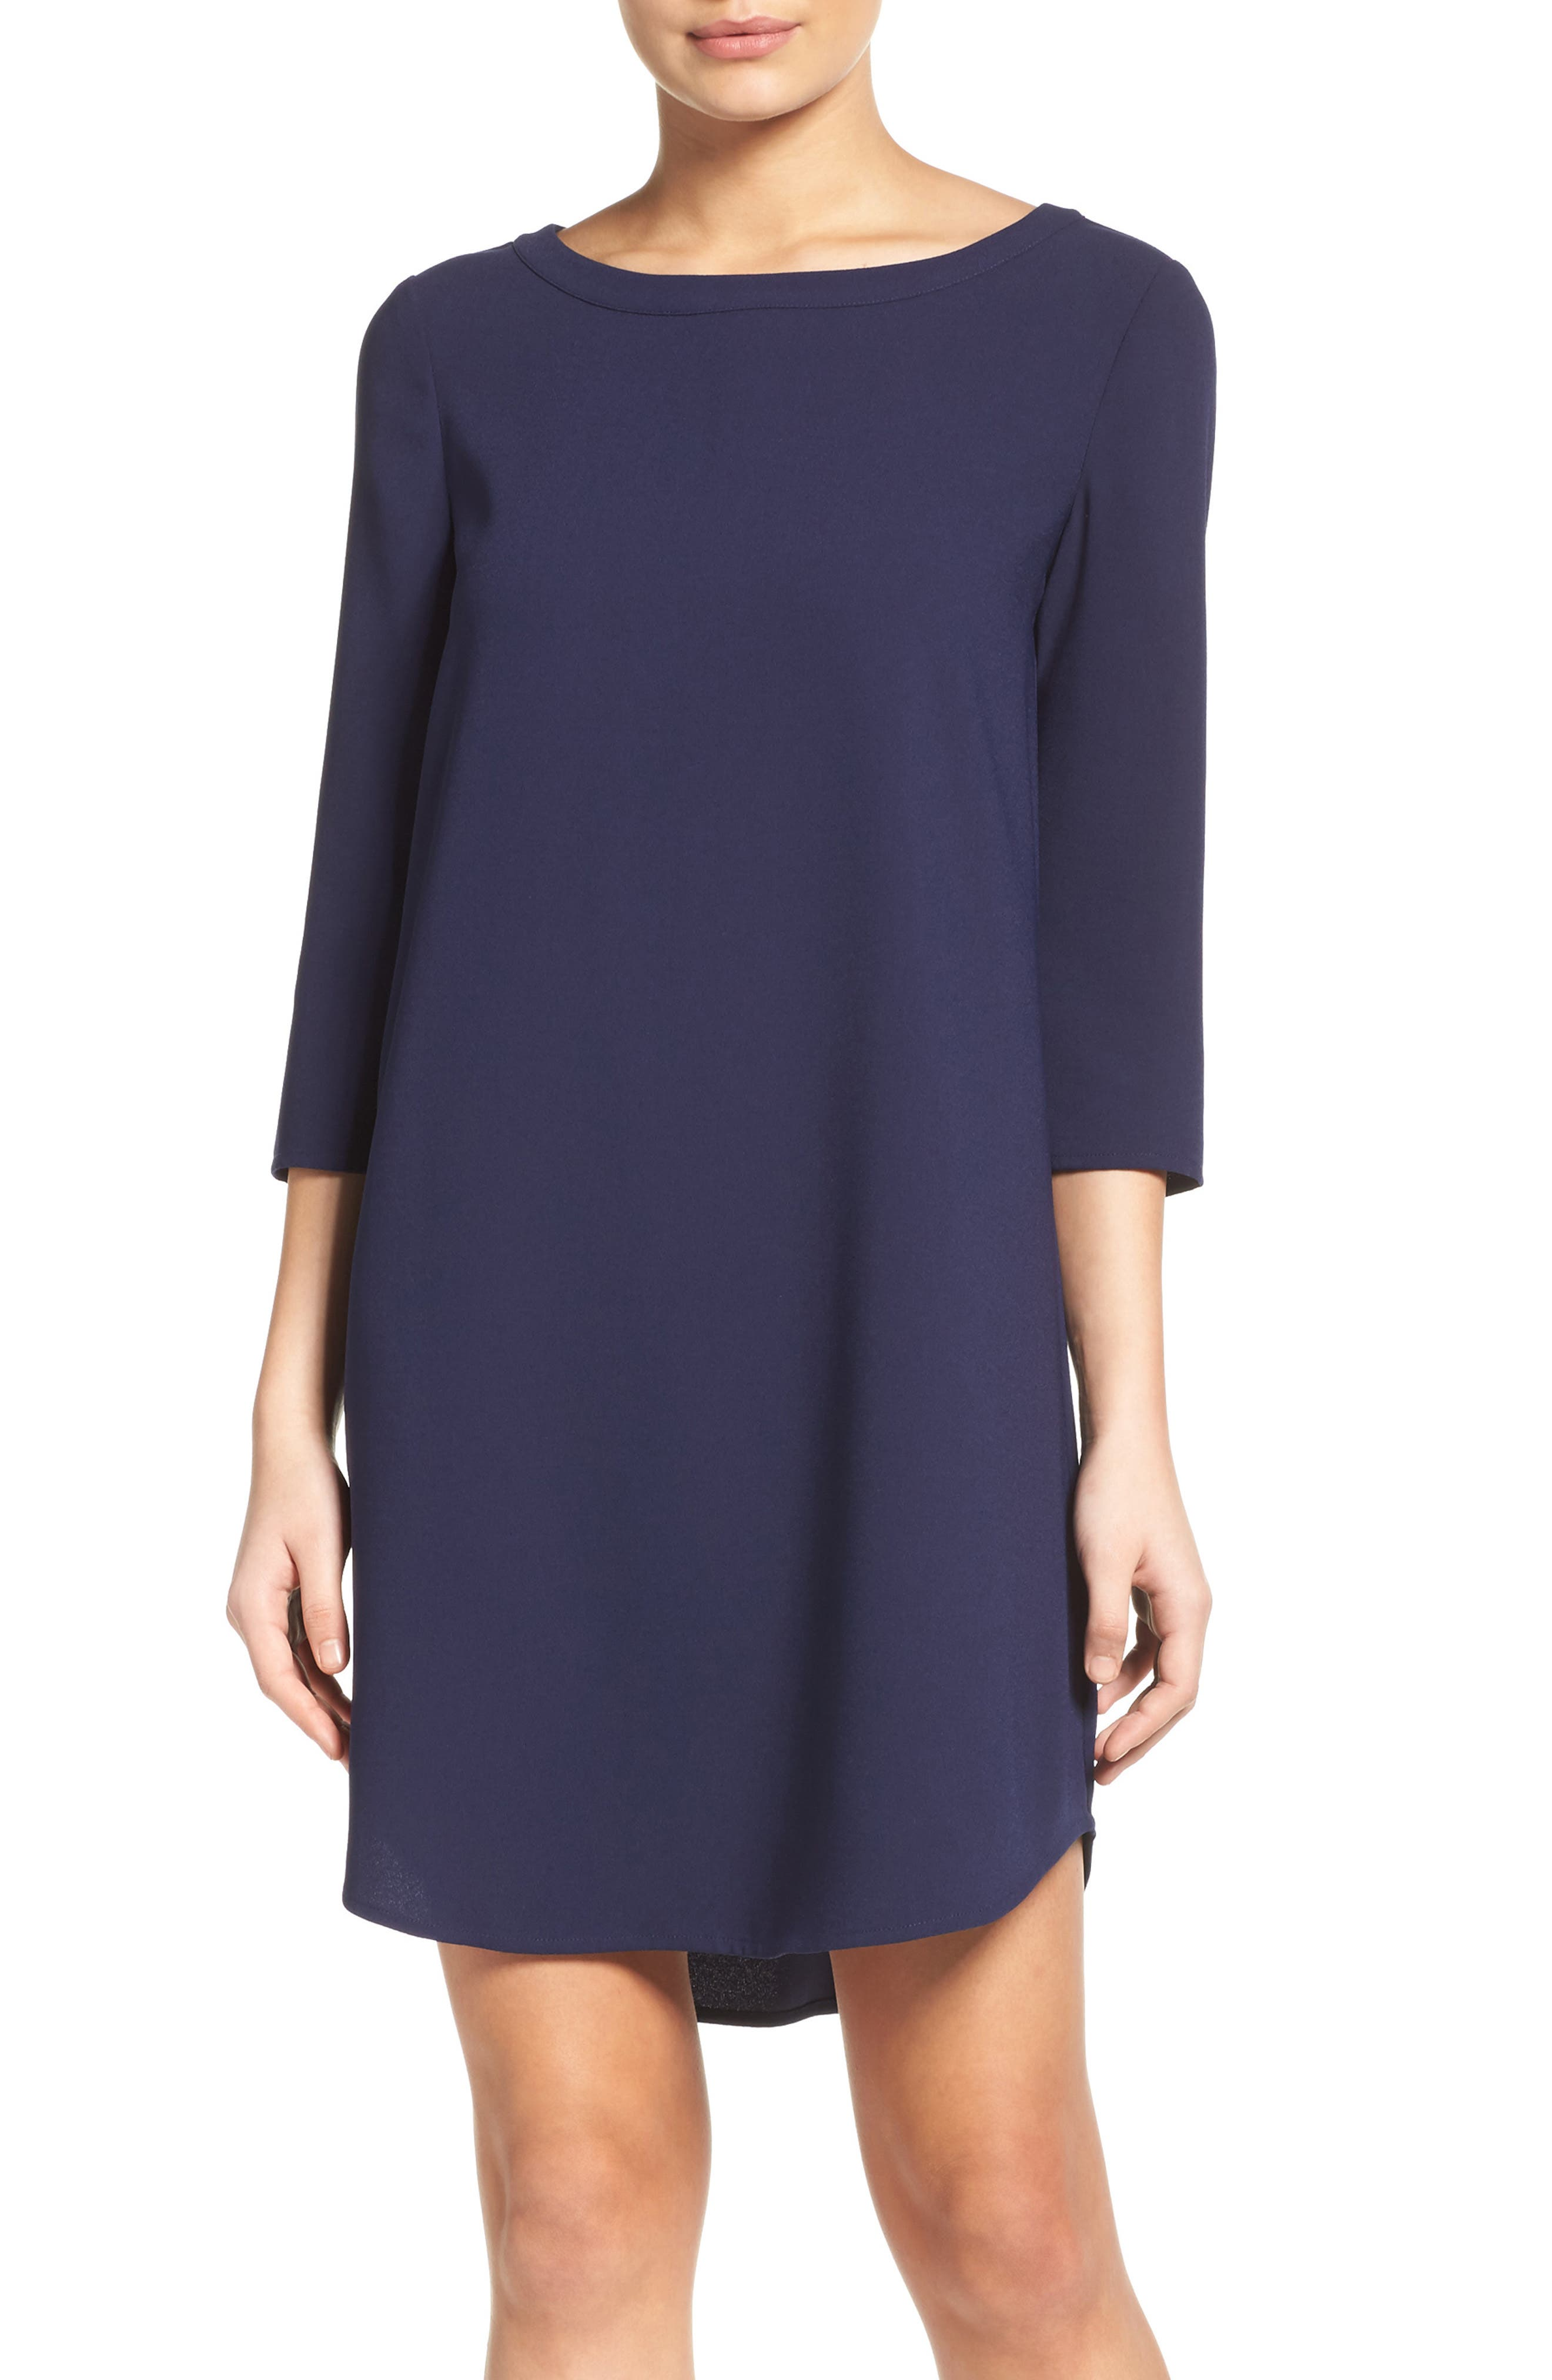 Bb Dakota Jazlyn Crepe Shift Dress, Blue